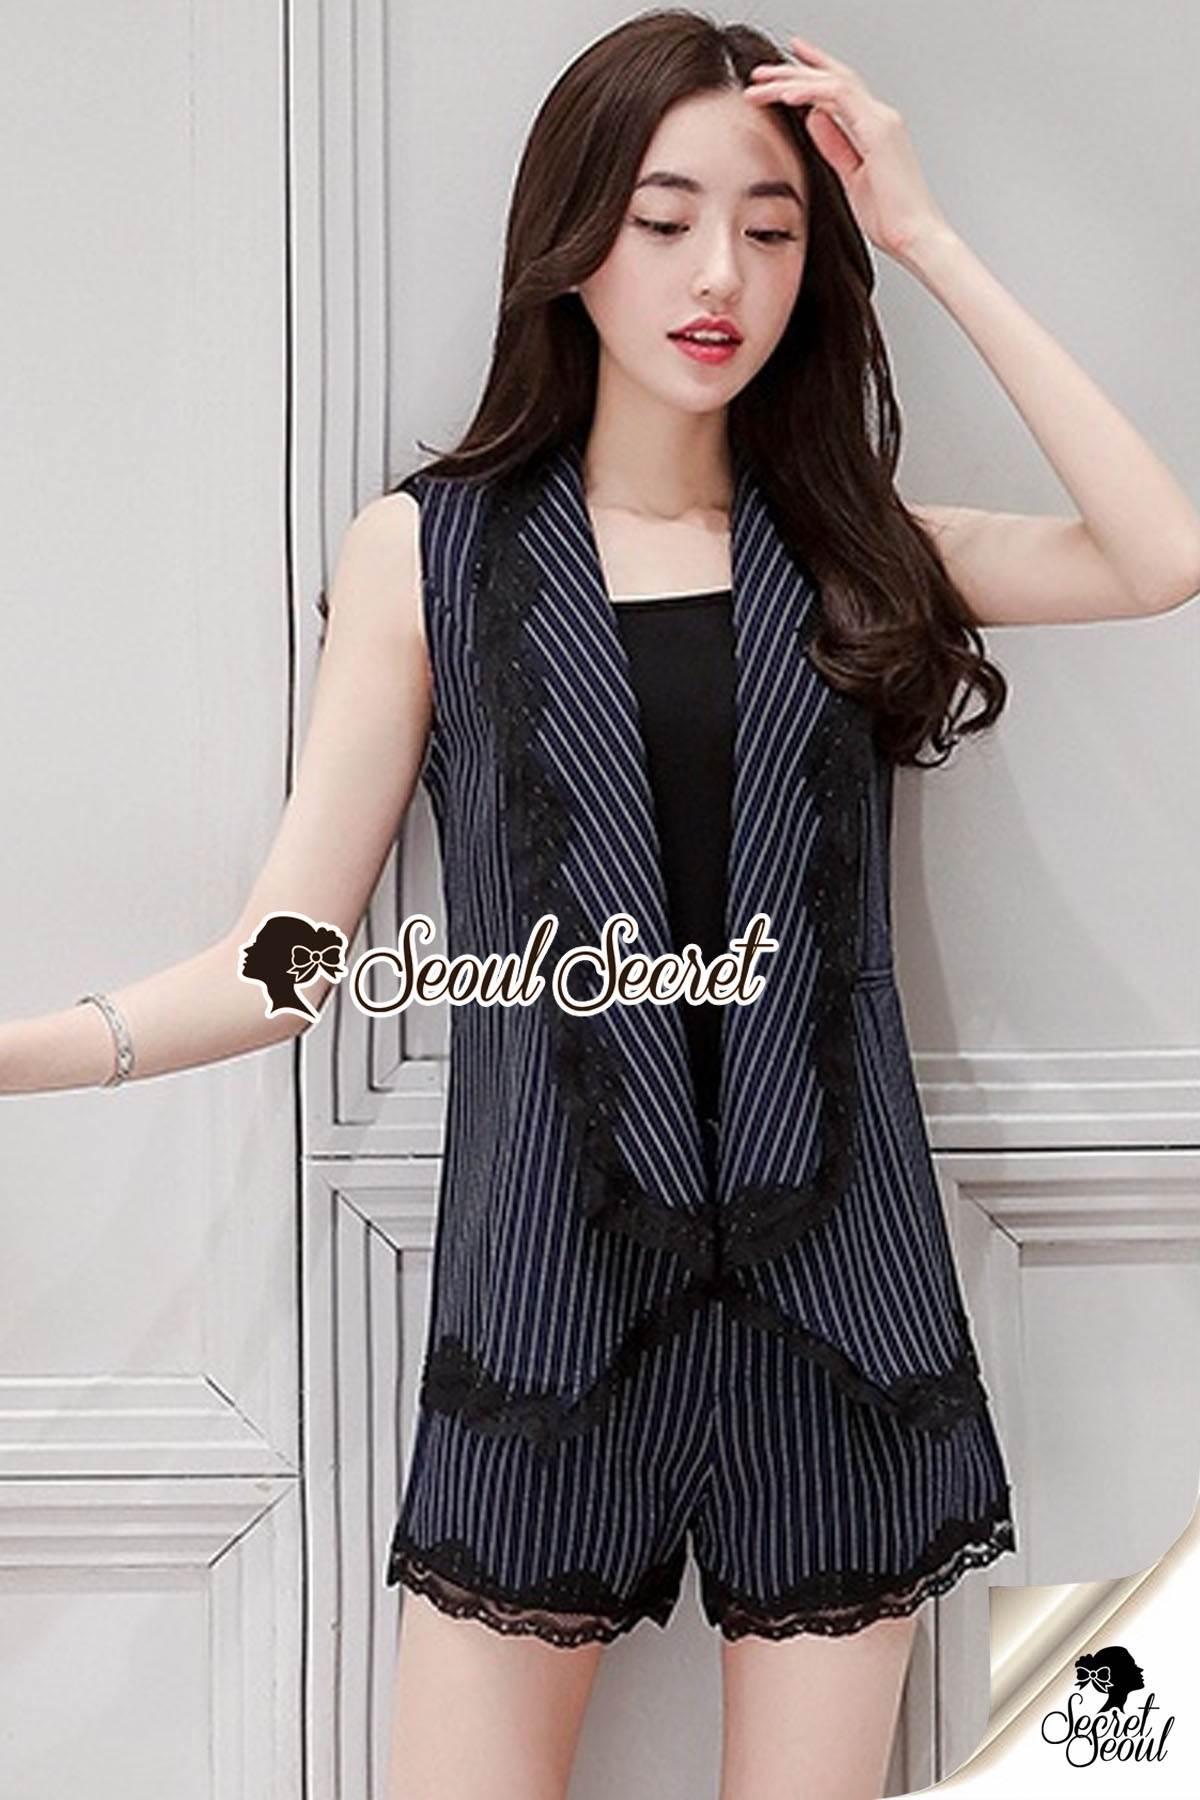 Seoul Secret Say's... Girly Stripe Lace Rim Furnished Suite Set